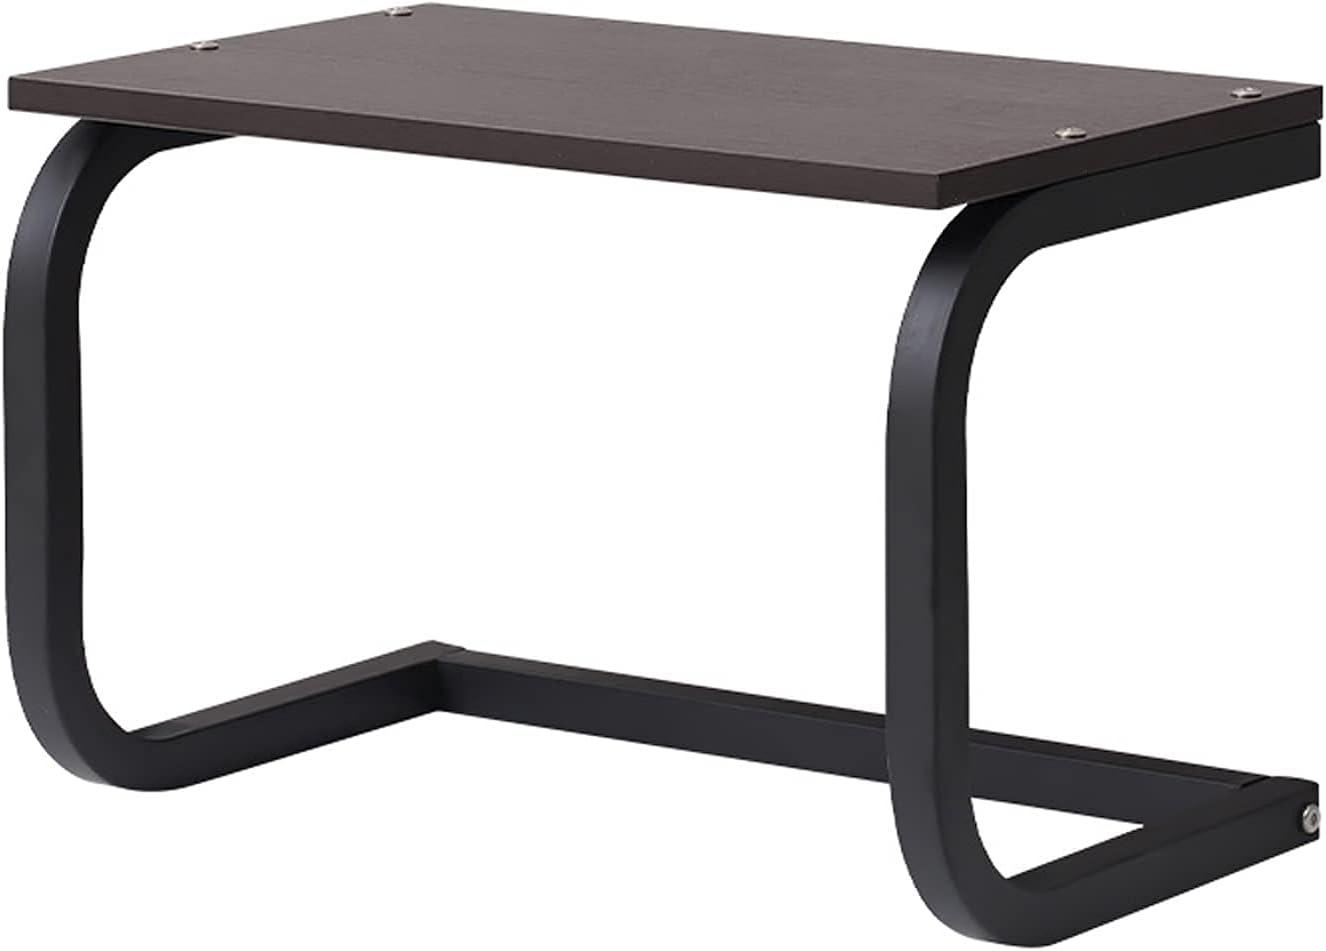 Gorgeous BERTY·PUYI Regular dealer Printer Stand Table Shelf with